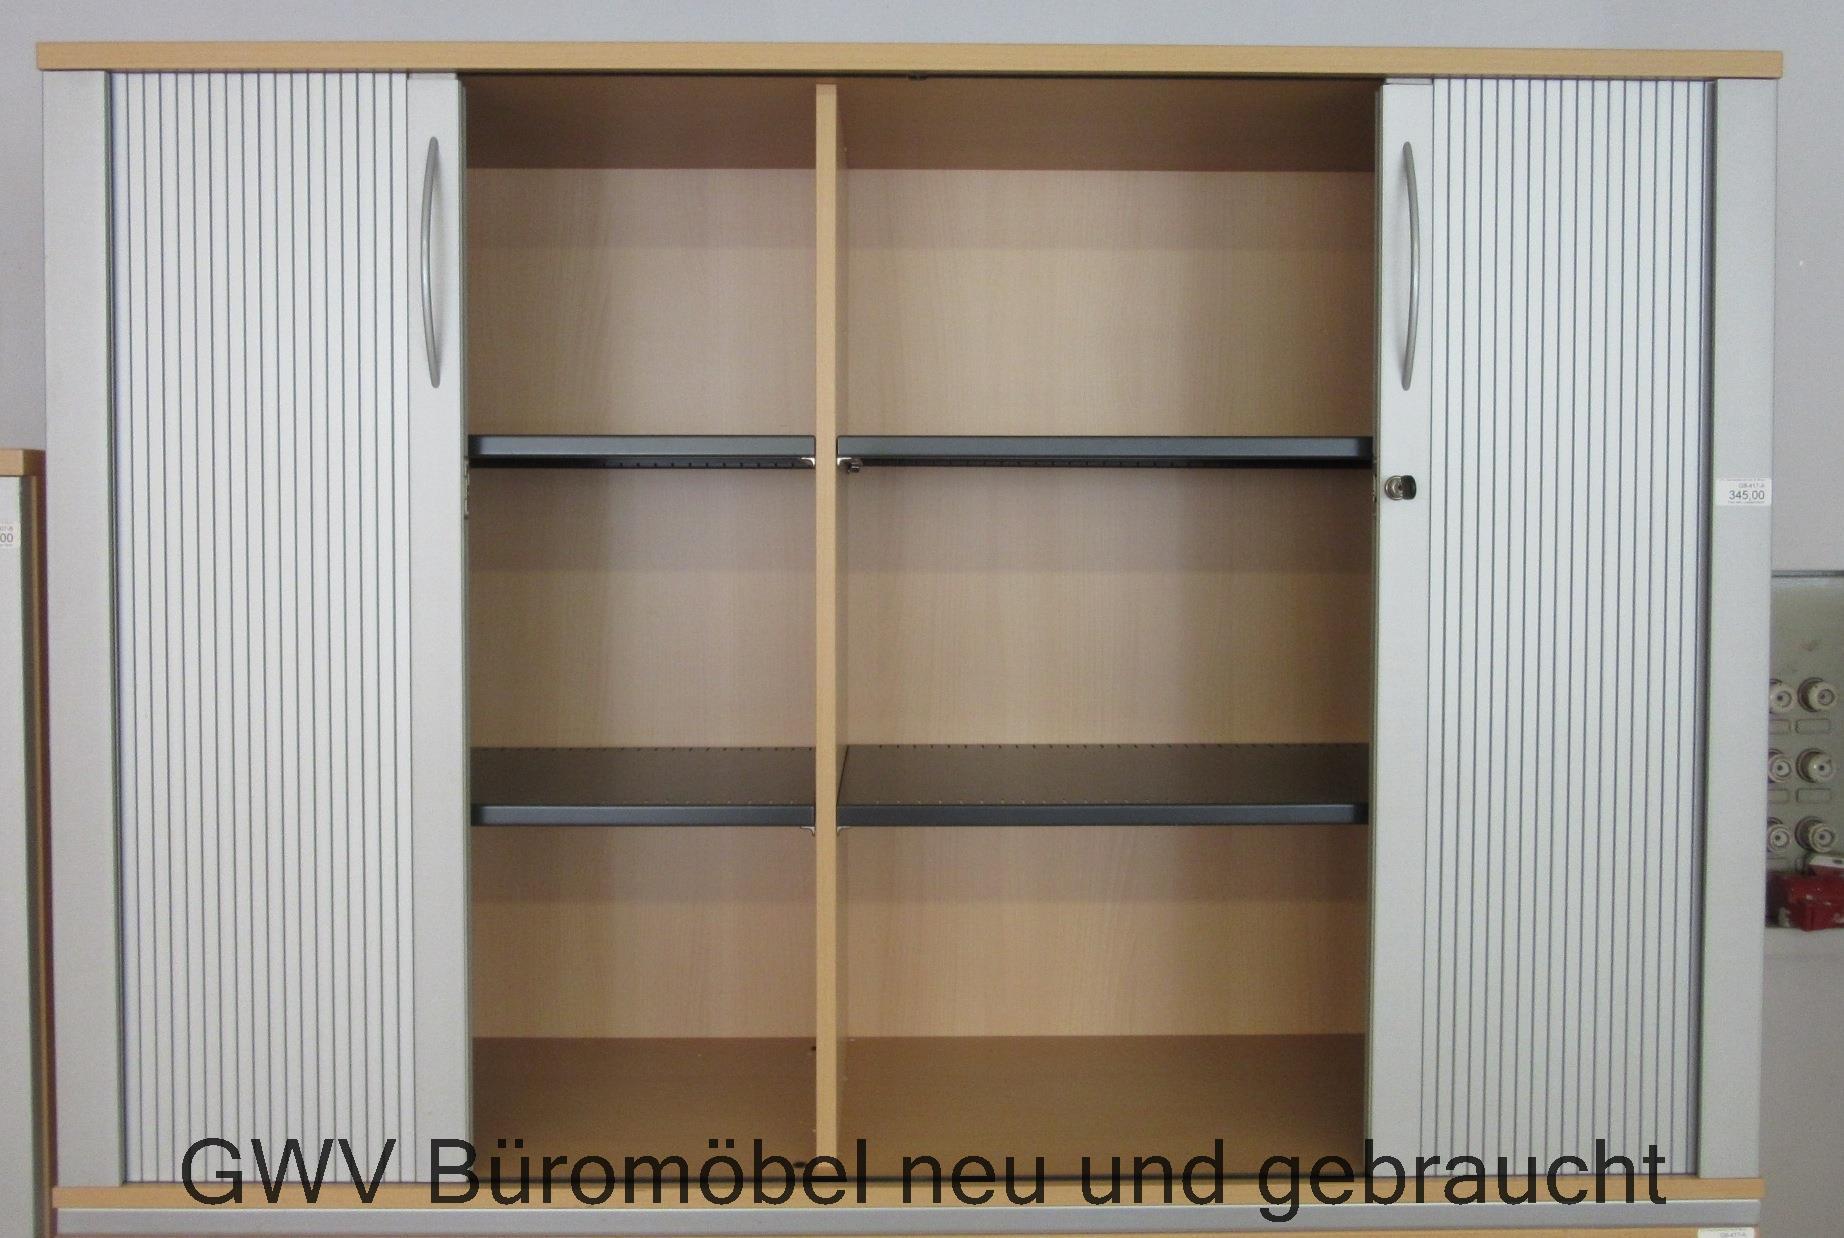 aktenschrank sideboard b ro offic stauraum jalousieschrank. Black Bedroom Furniture Sets. Home Design Ideas